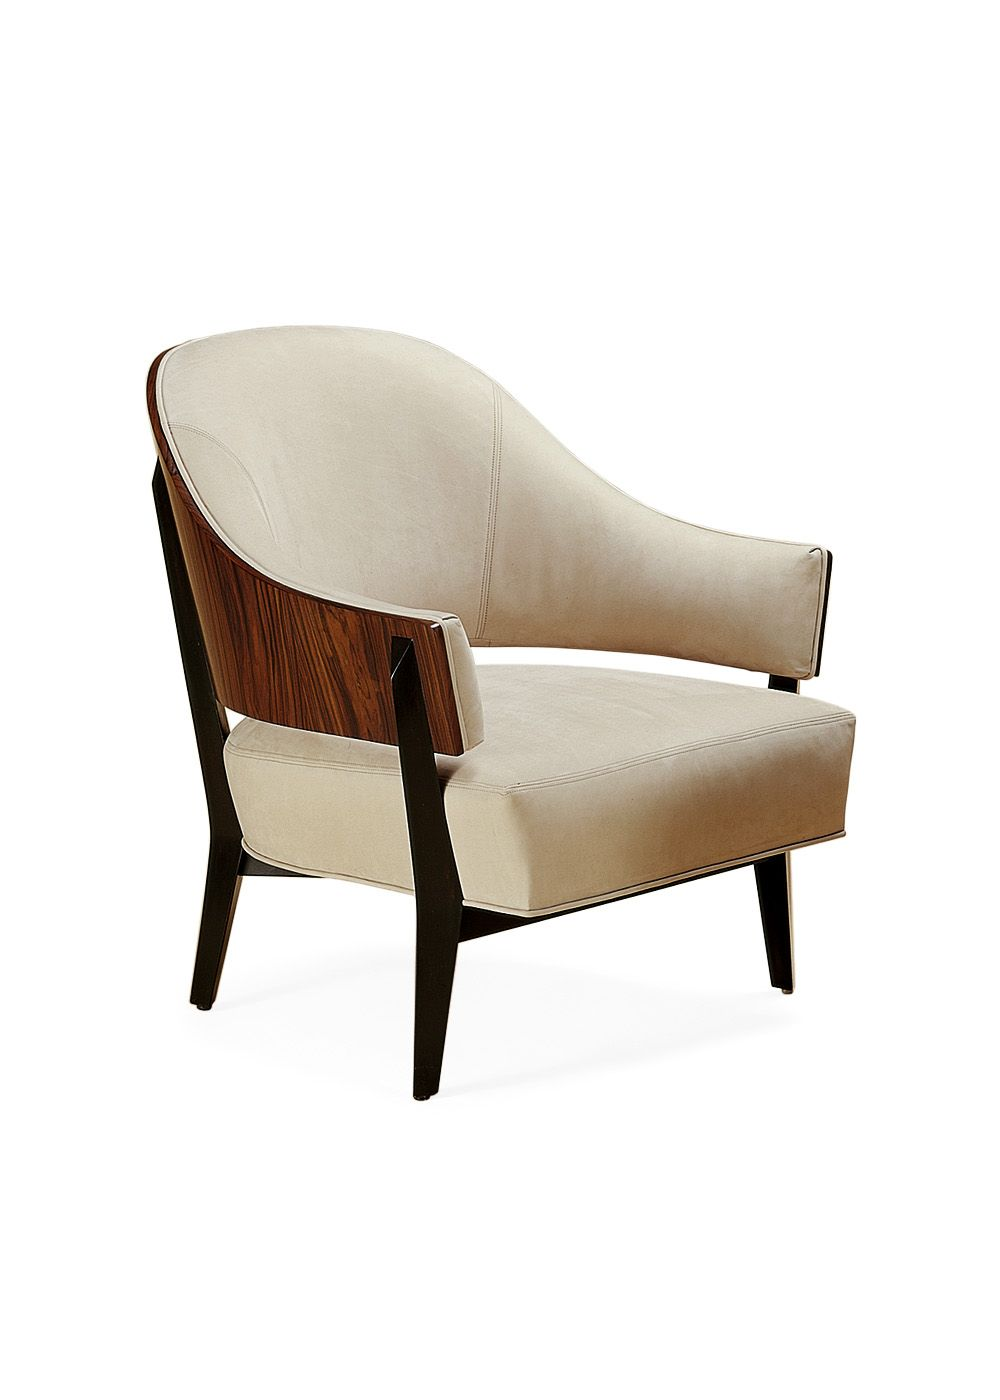 Excellent Kyoto Lounge Chair T2007 By Therien Occasional Chairs Inzonedesignstudio Interior Chair Design Inzonedesignstudiocom